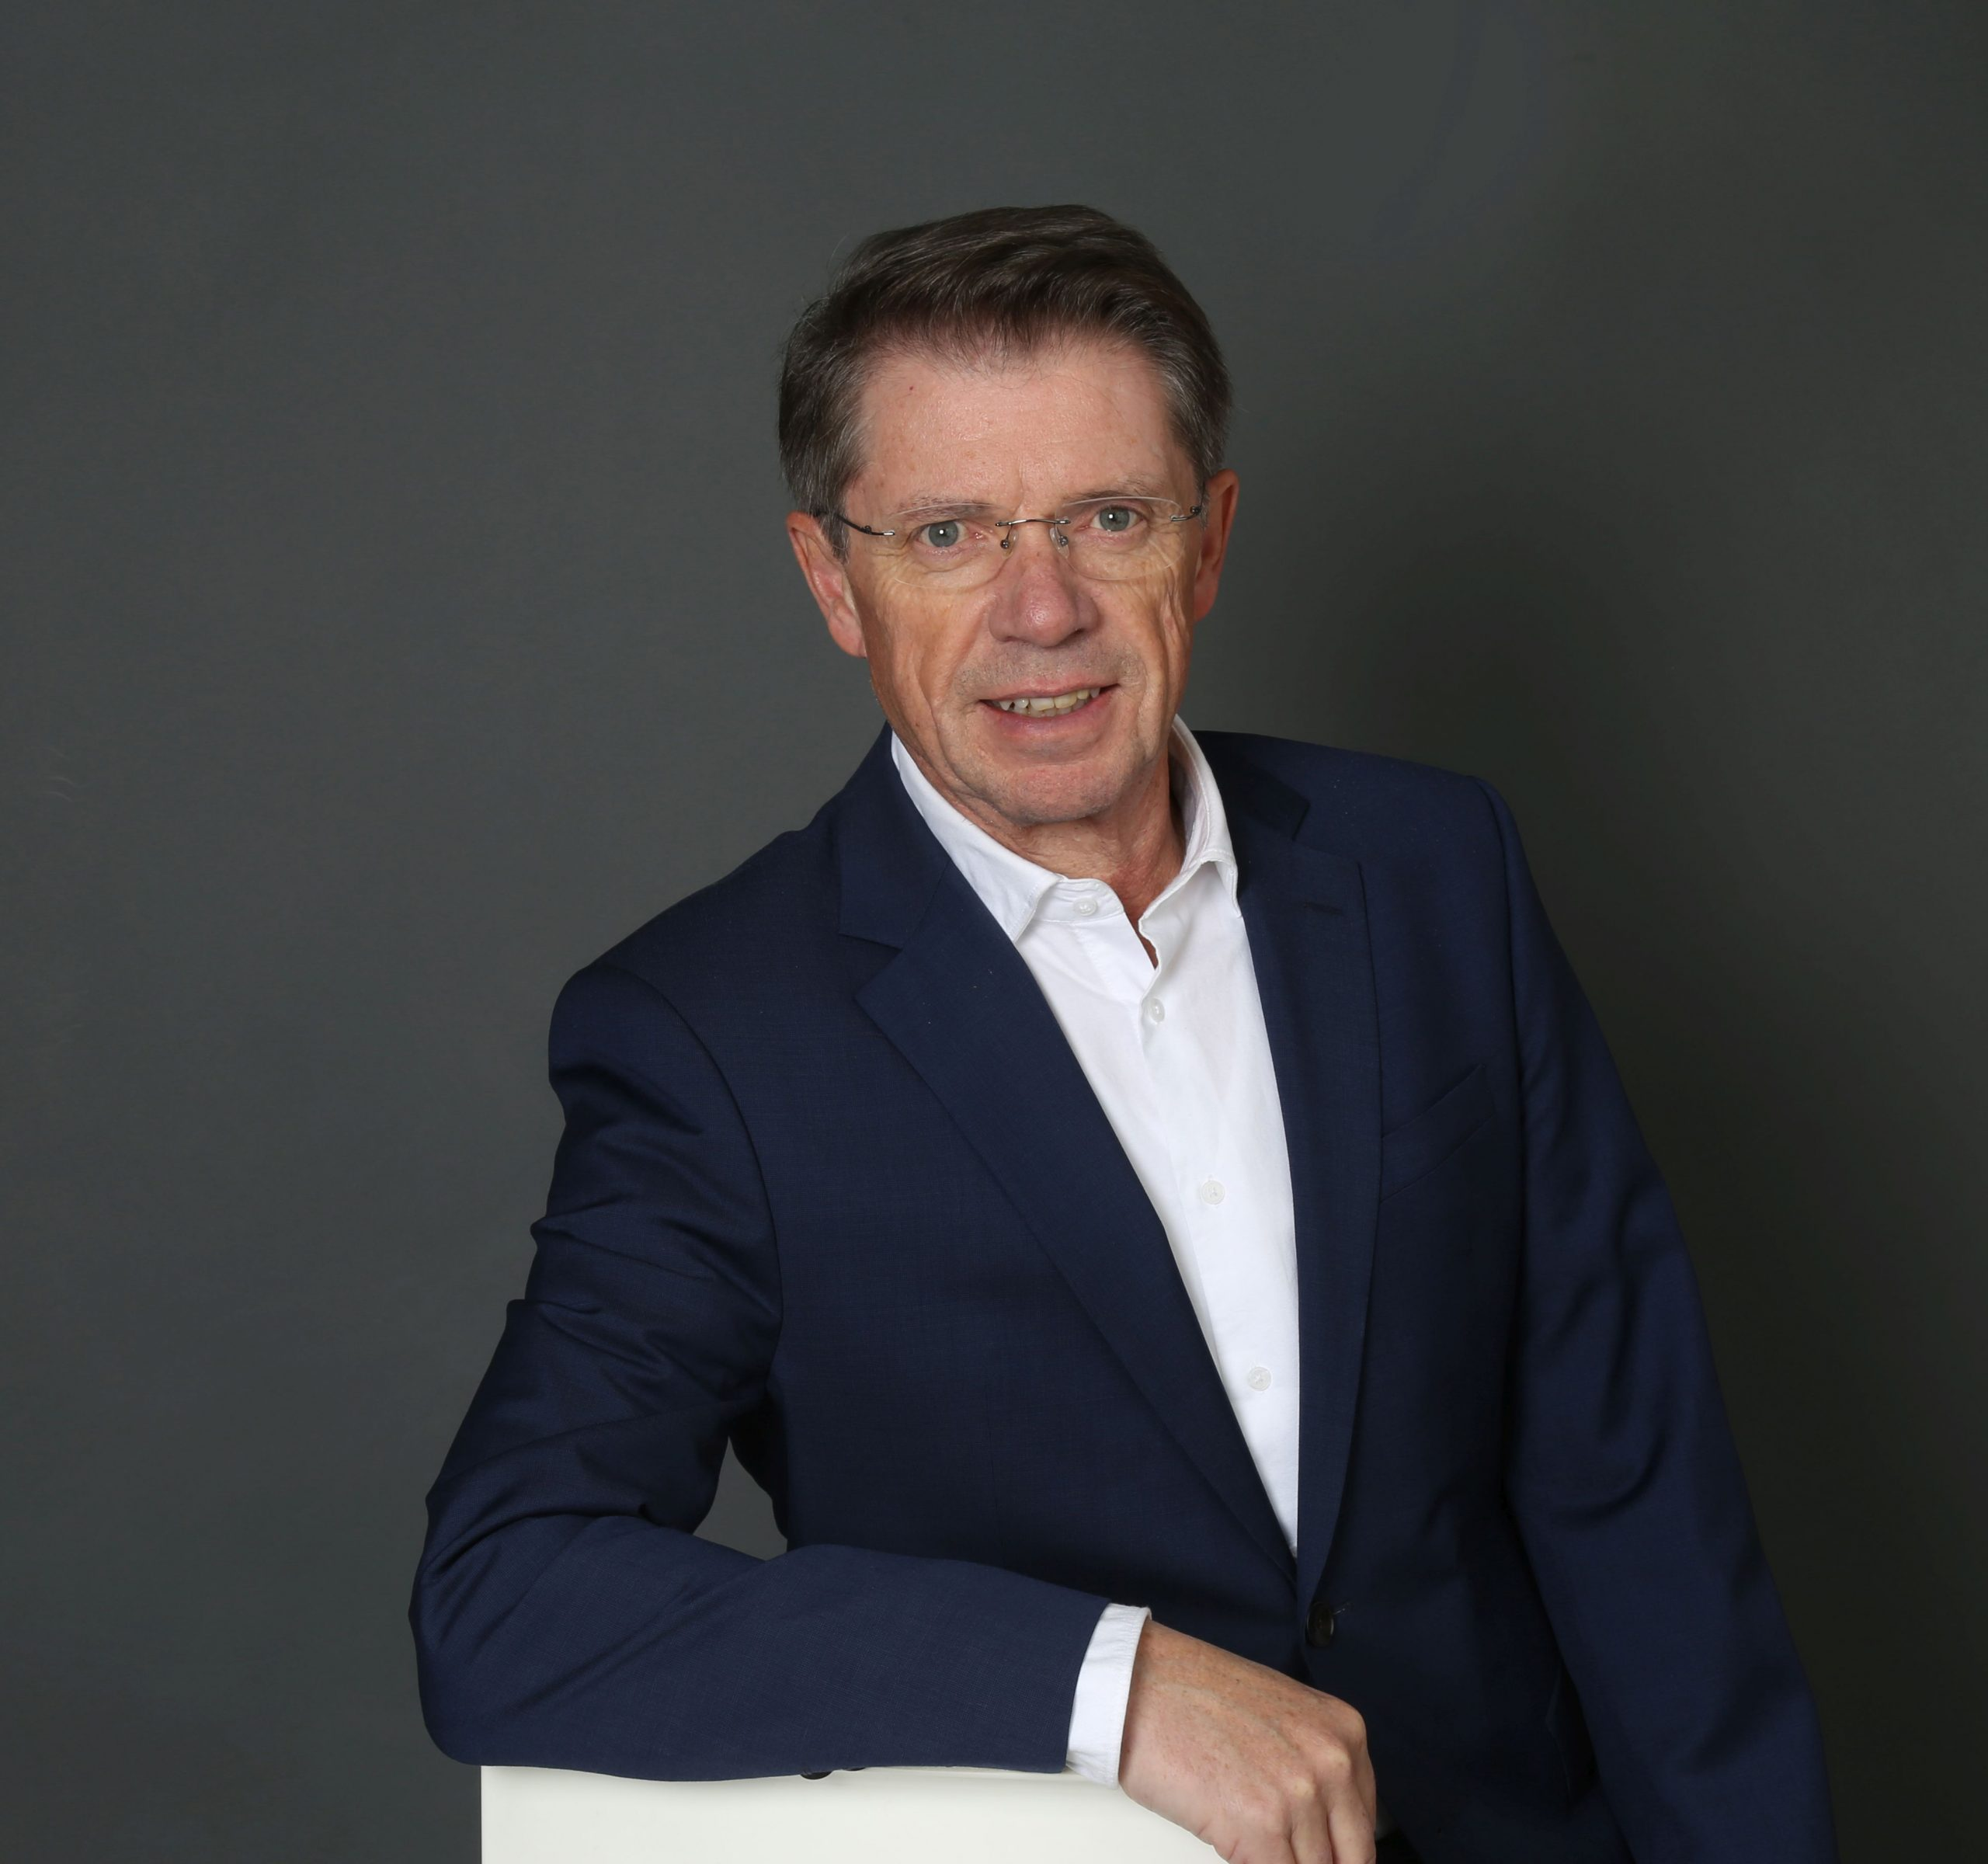 Andreas Wagner, Bittium